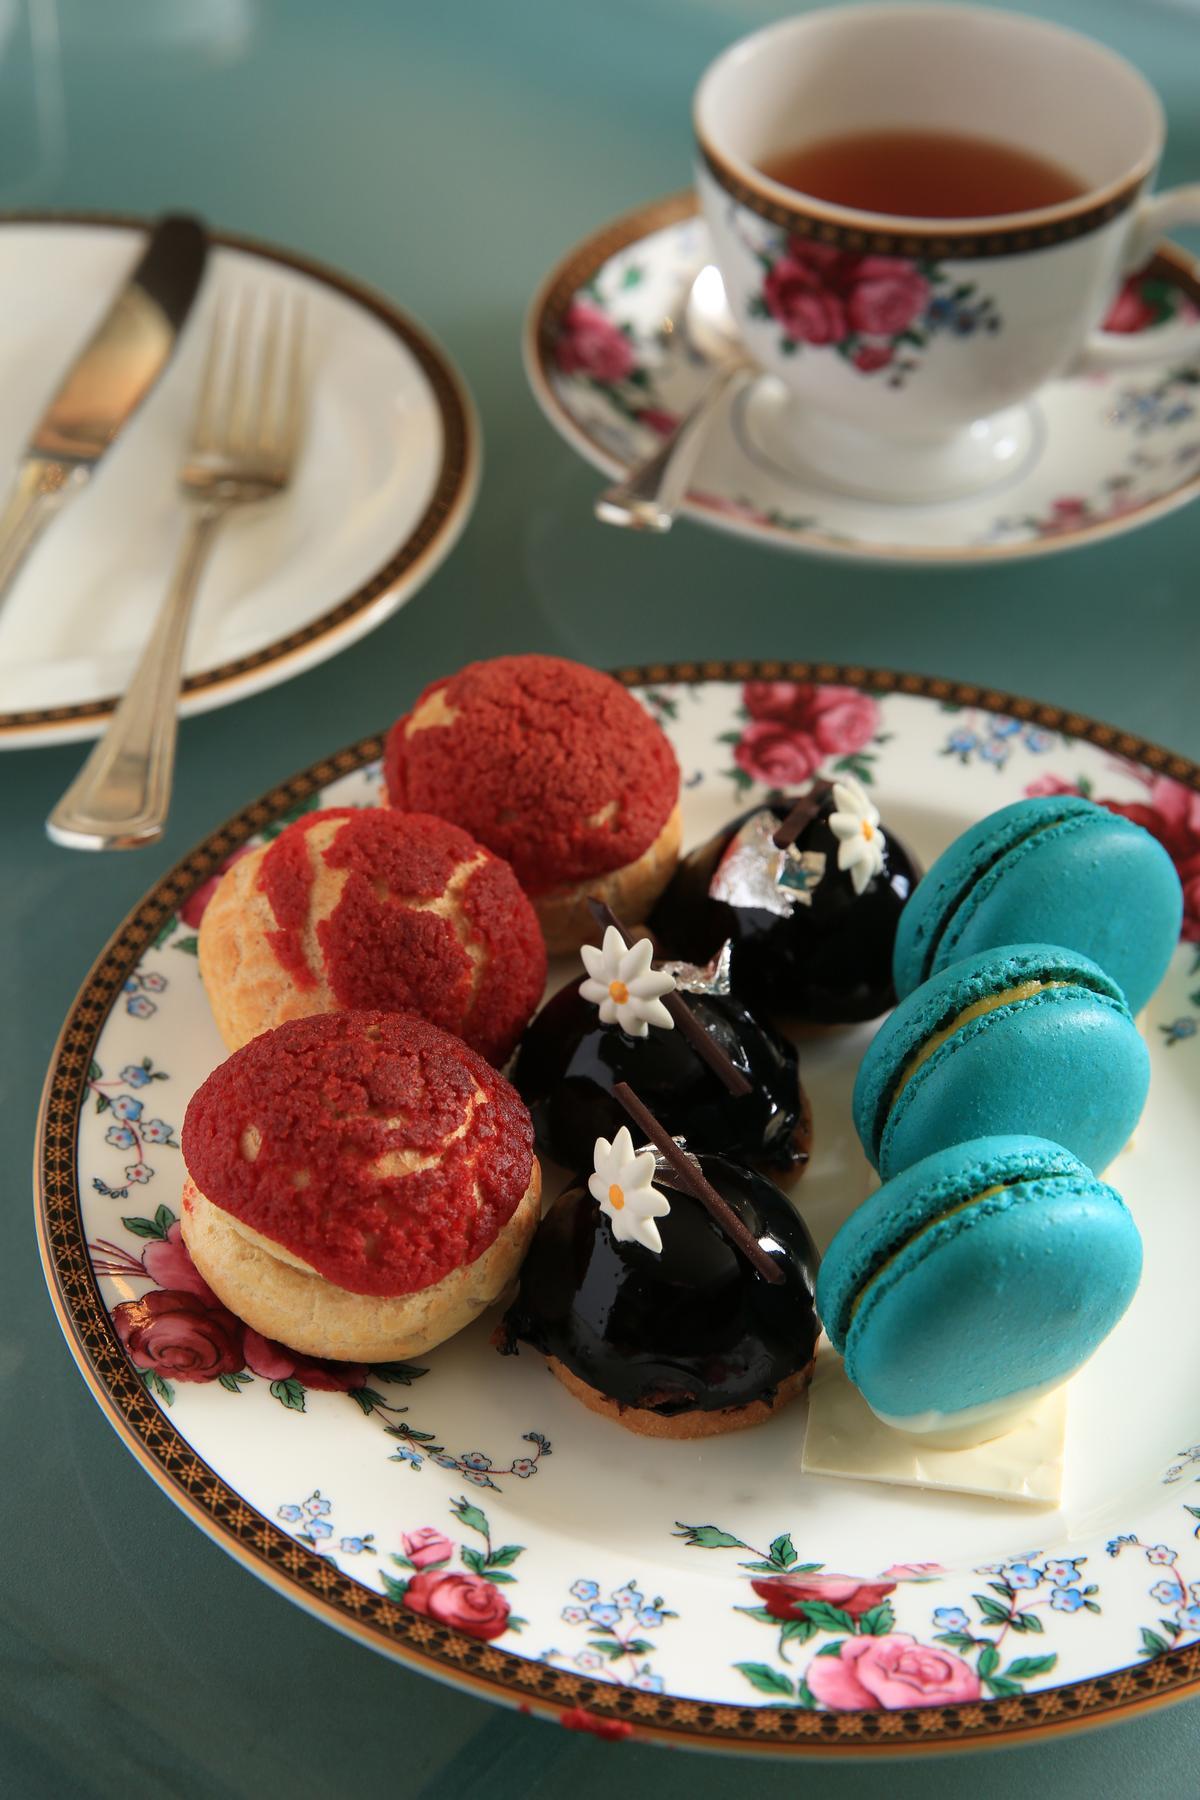 Wedgwood的瓷盤,配上色彩鮮豔的馬卡龍等西點,誘人食欲。